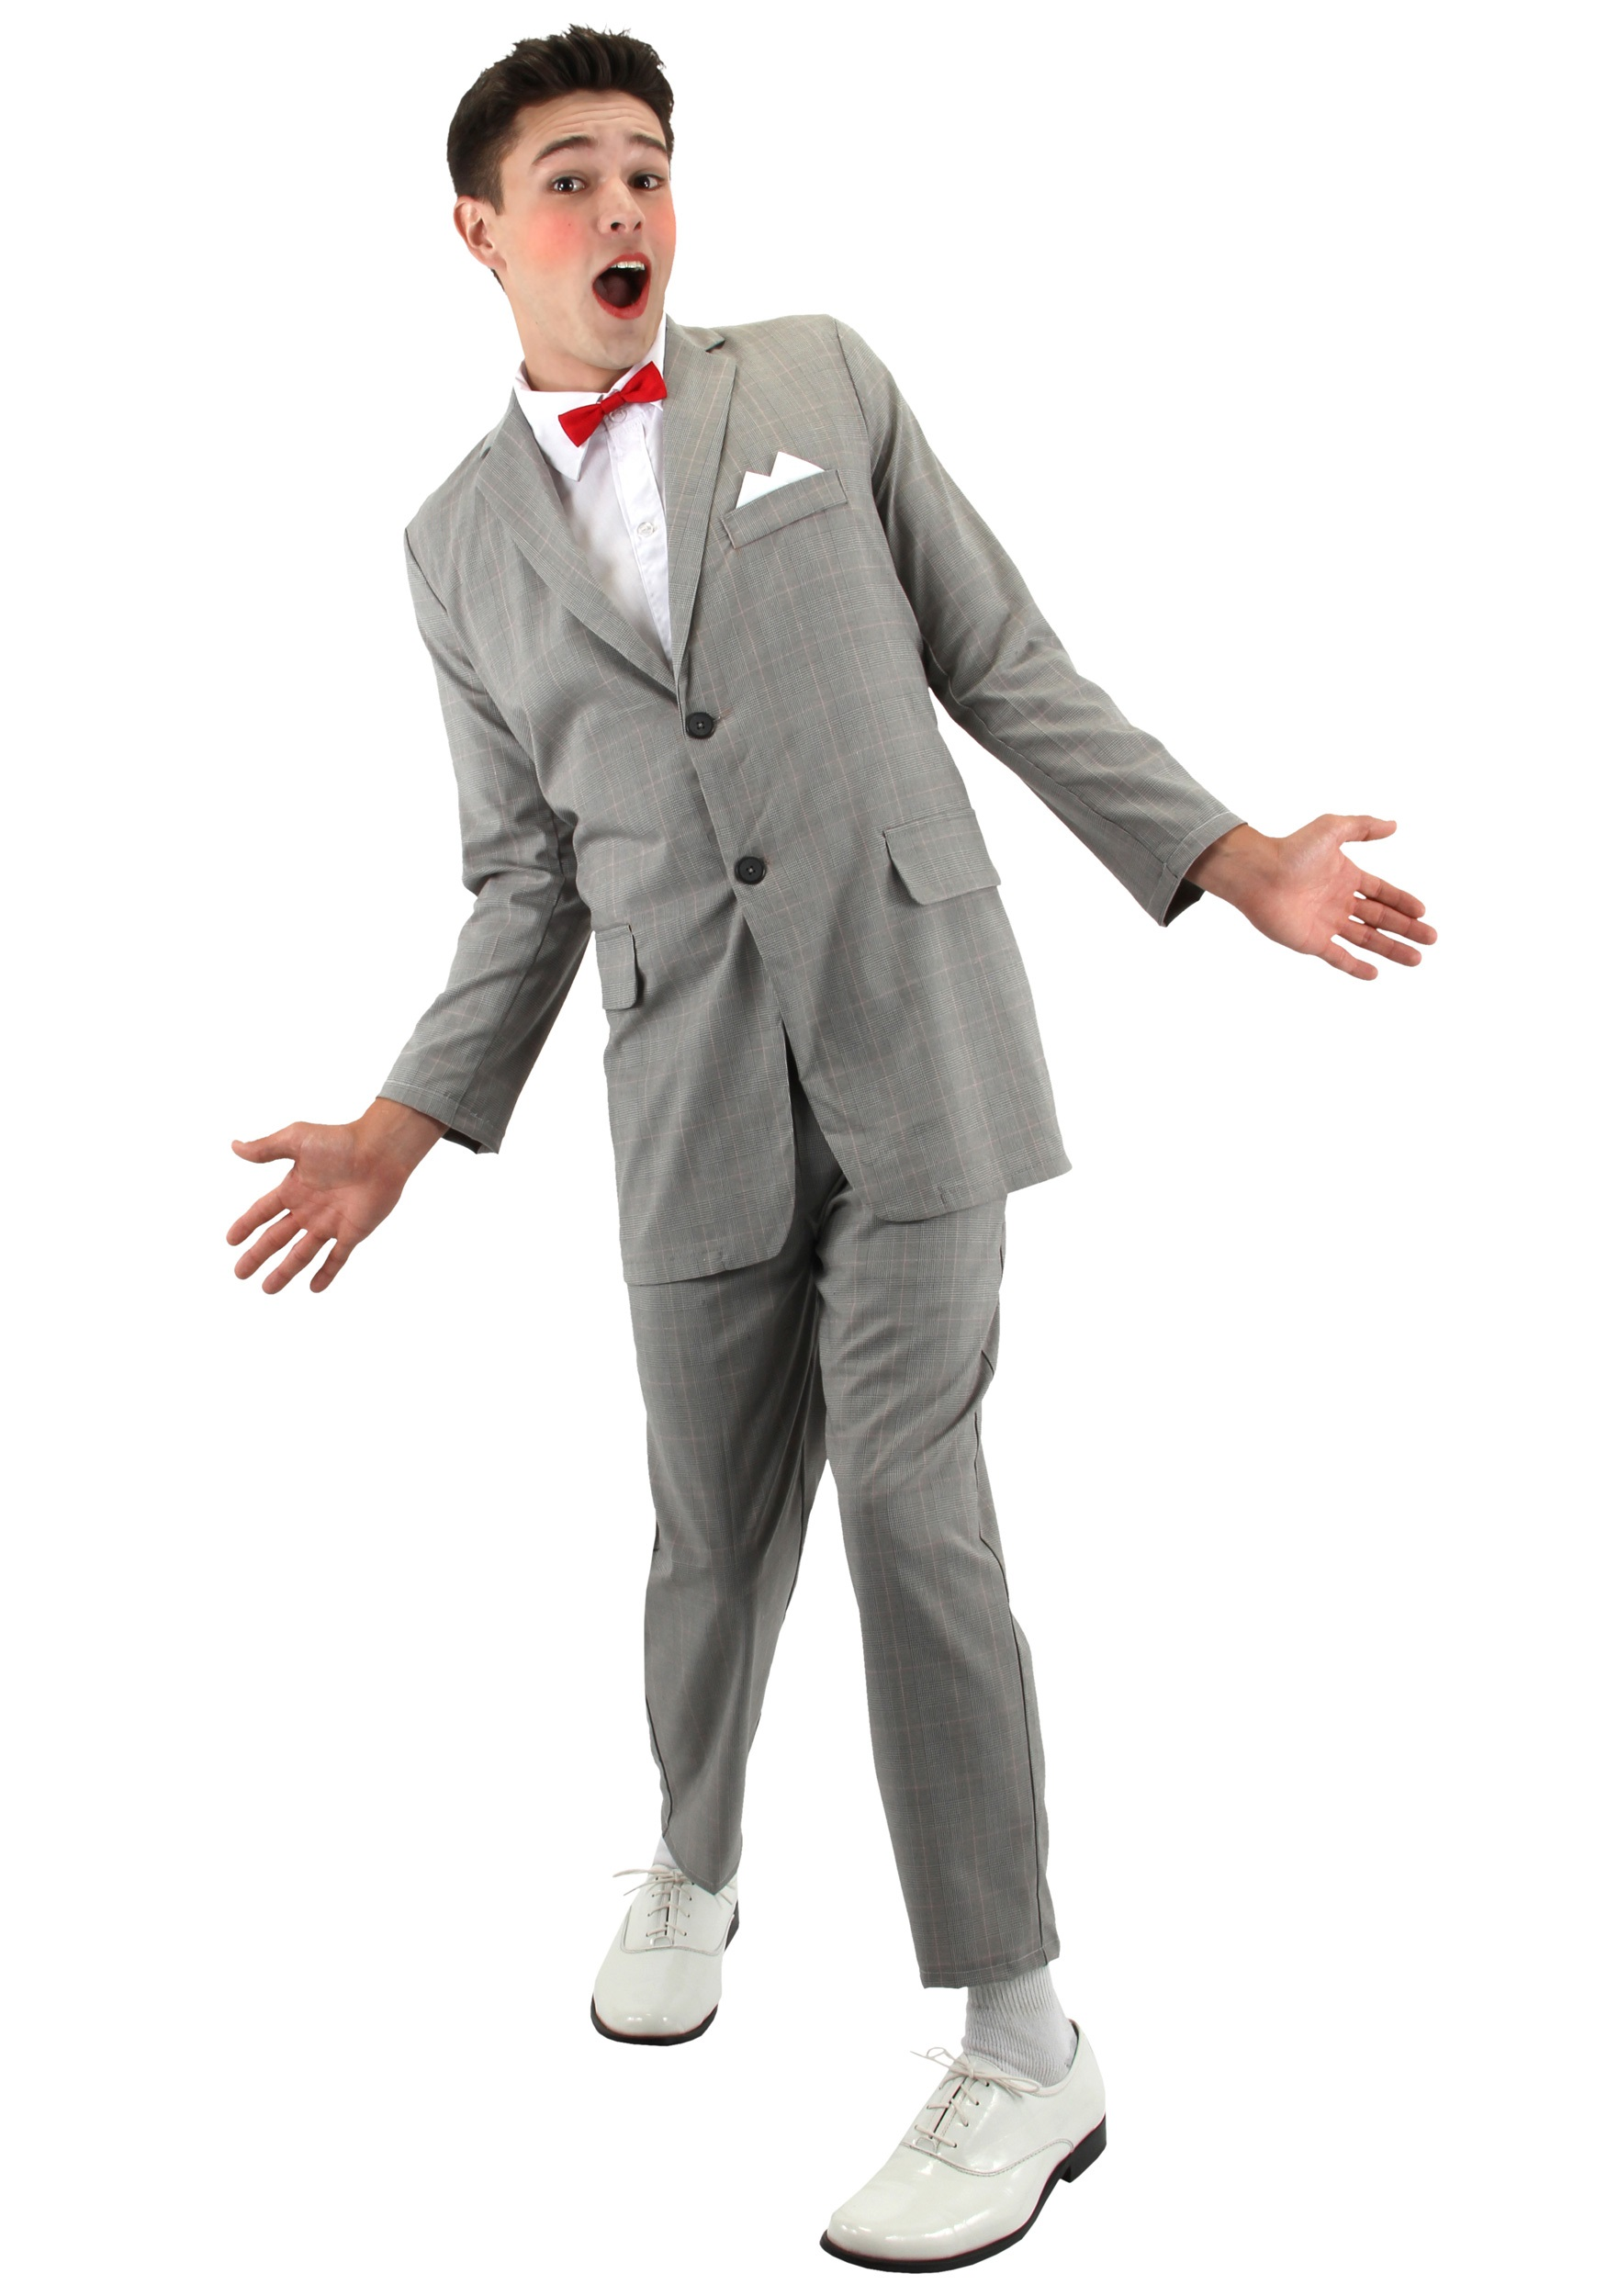 Costume Halloween Man.Adult Pee Wee Costume